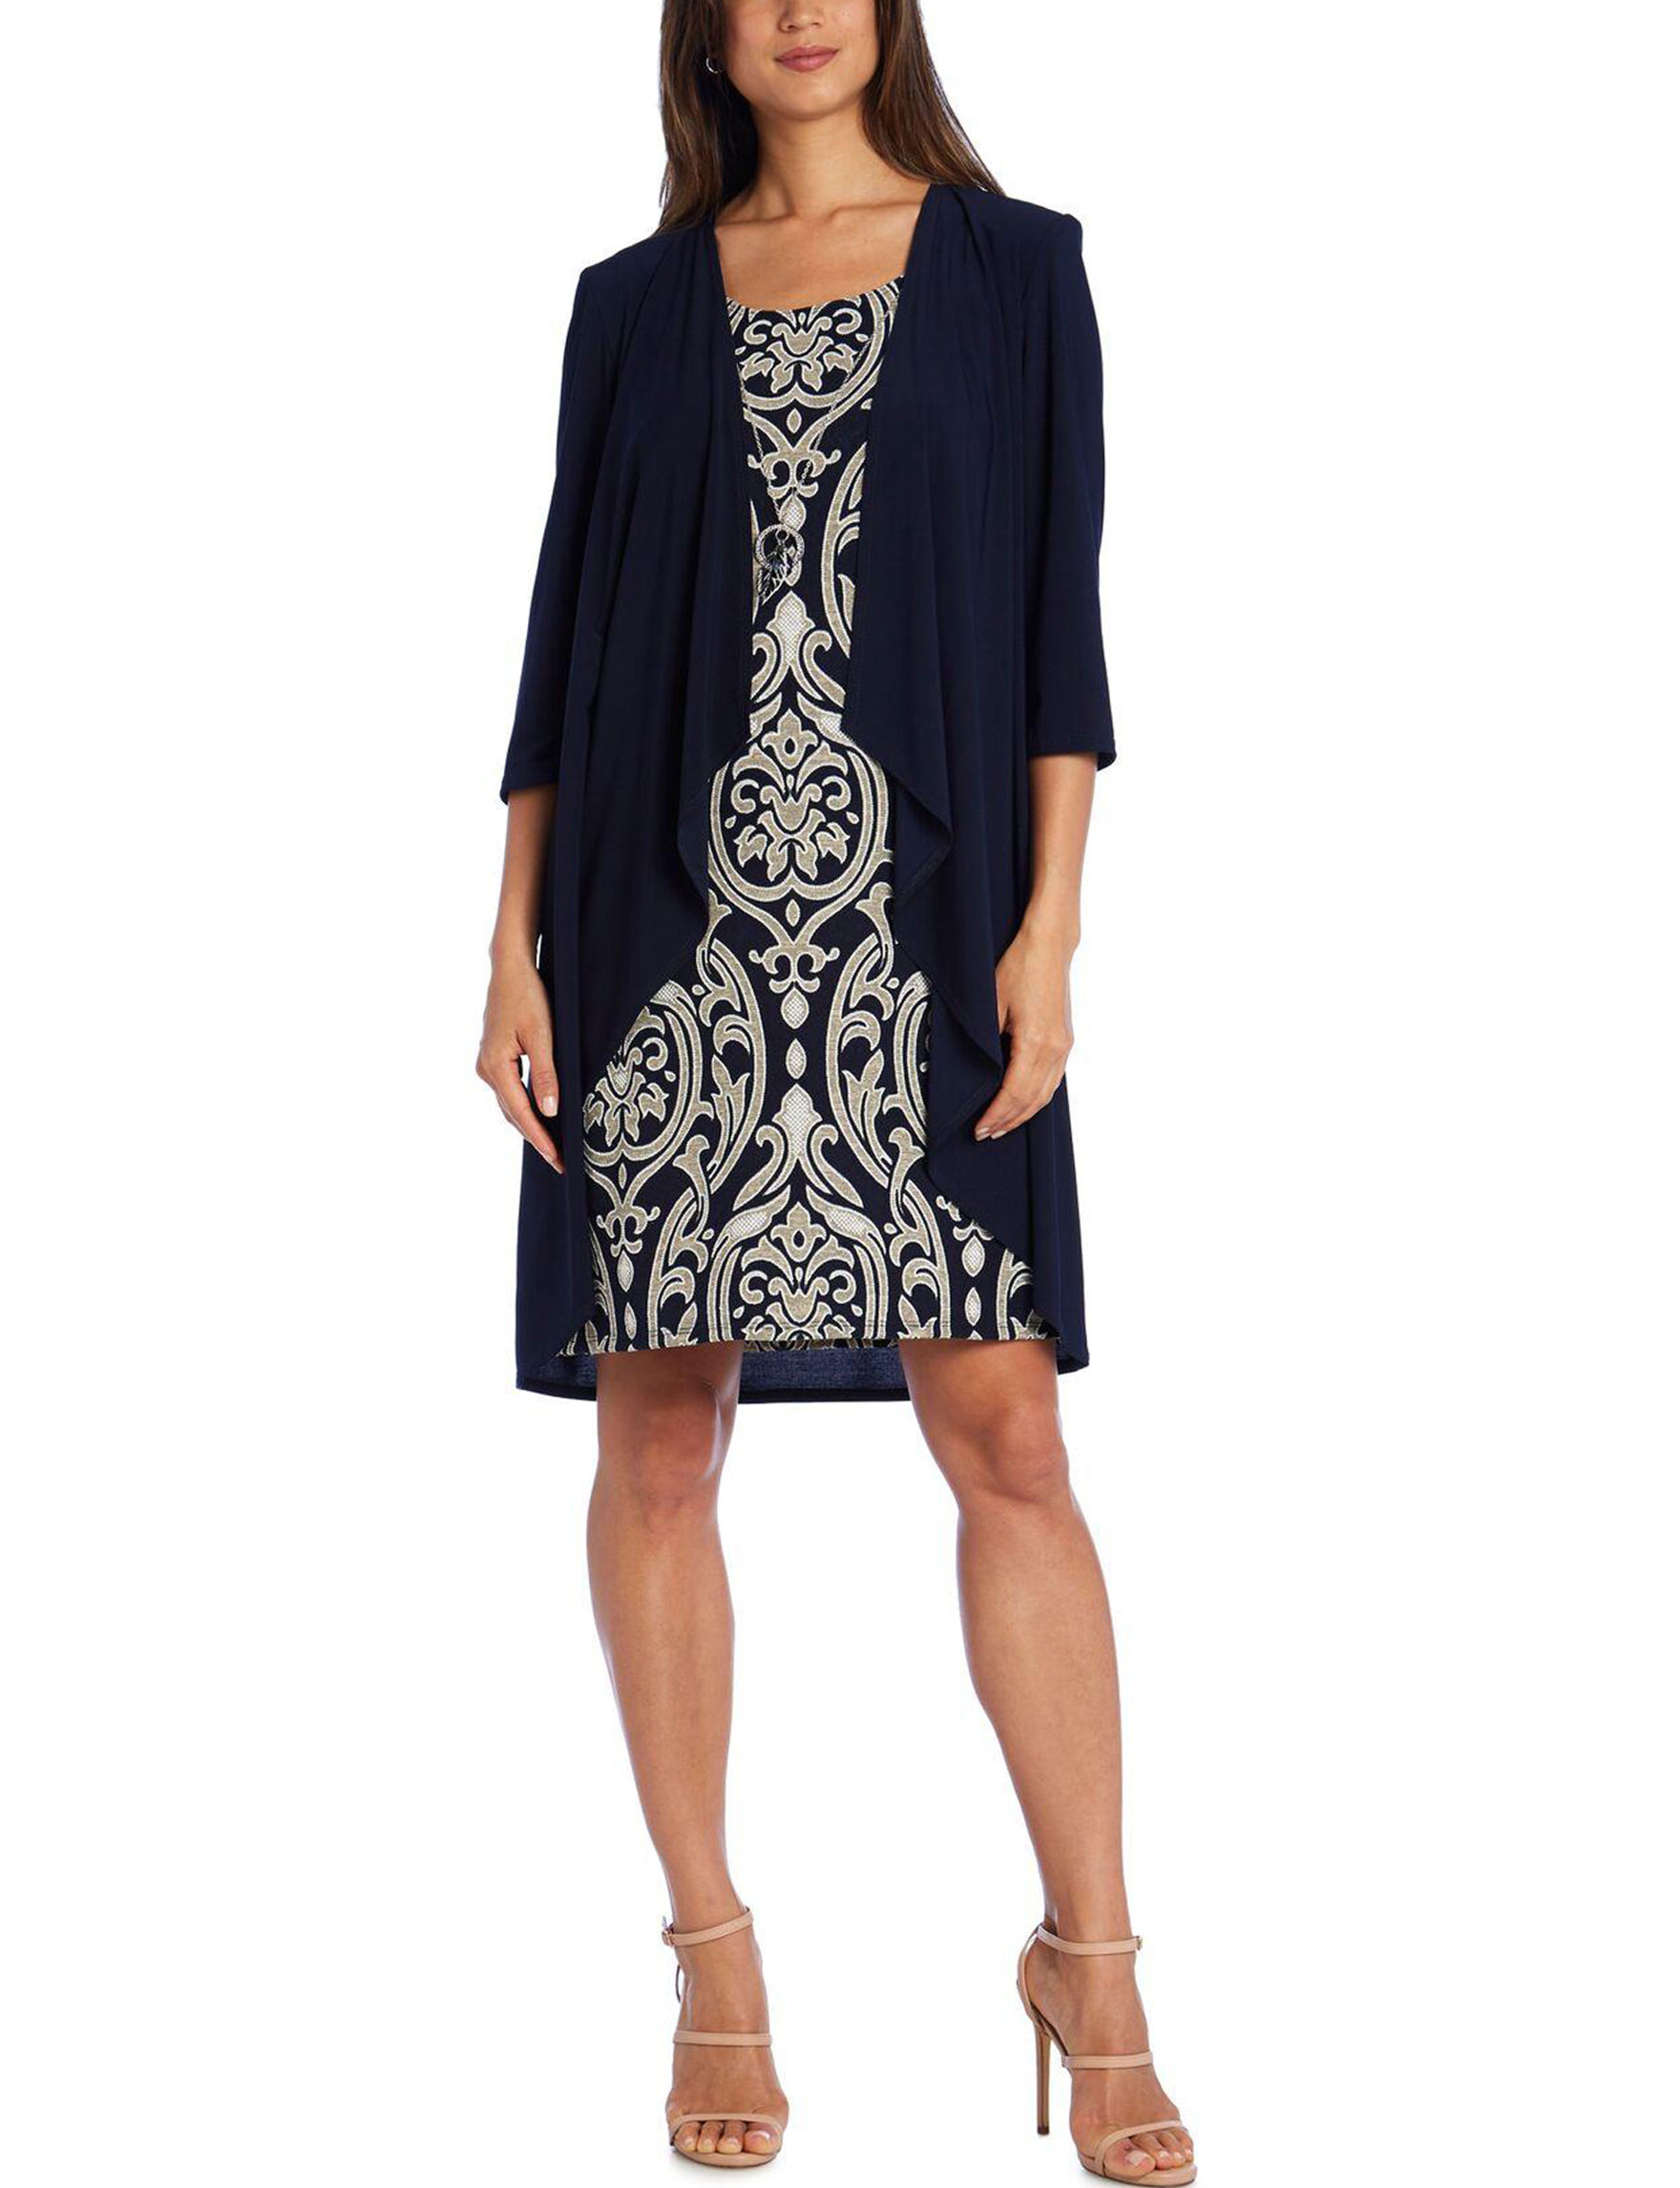 R & M Richards Navy / Taupe Evening & Formal Jacket Dresses